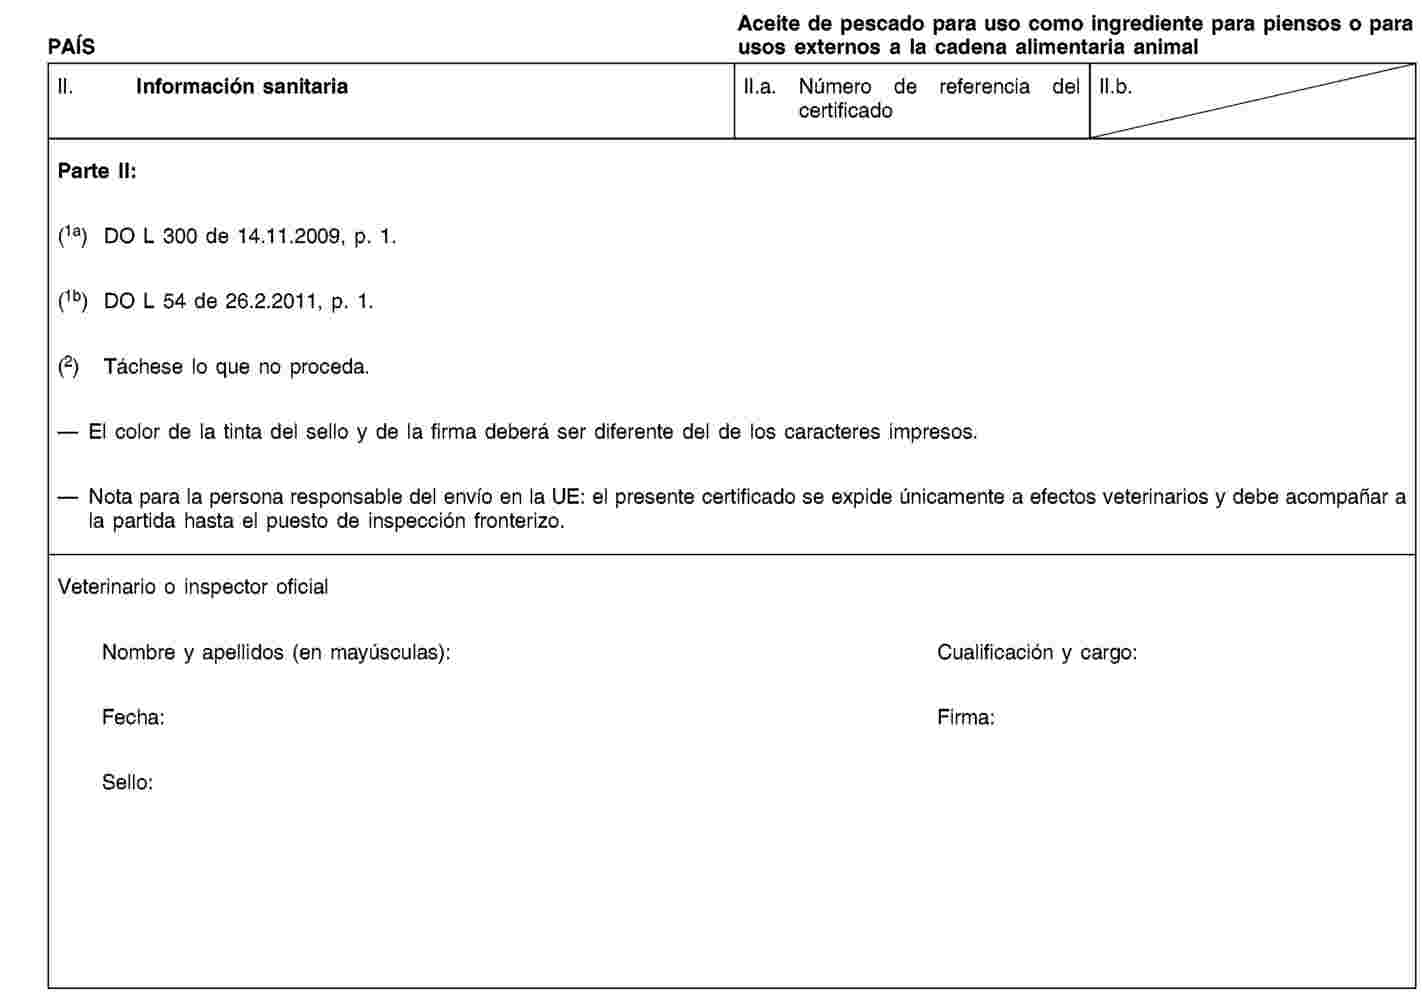 Imagen: https://eur-lex.europa.eu/resource.html?uri=uriserv:OJ.L_.2011.054.01.0001.01.SPA.xhtml.L_2011054ES.01020401.tif.jpg